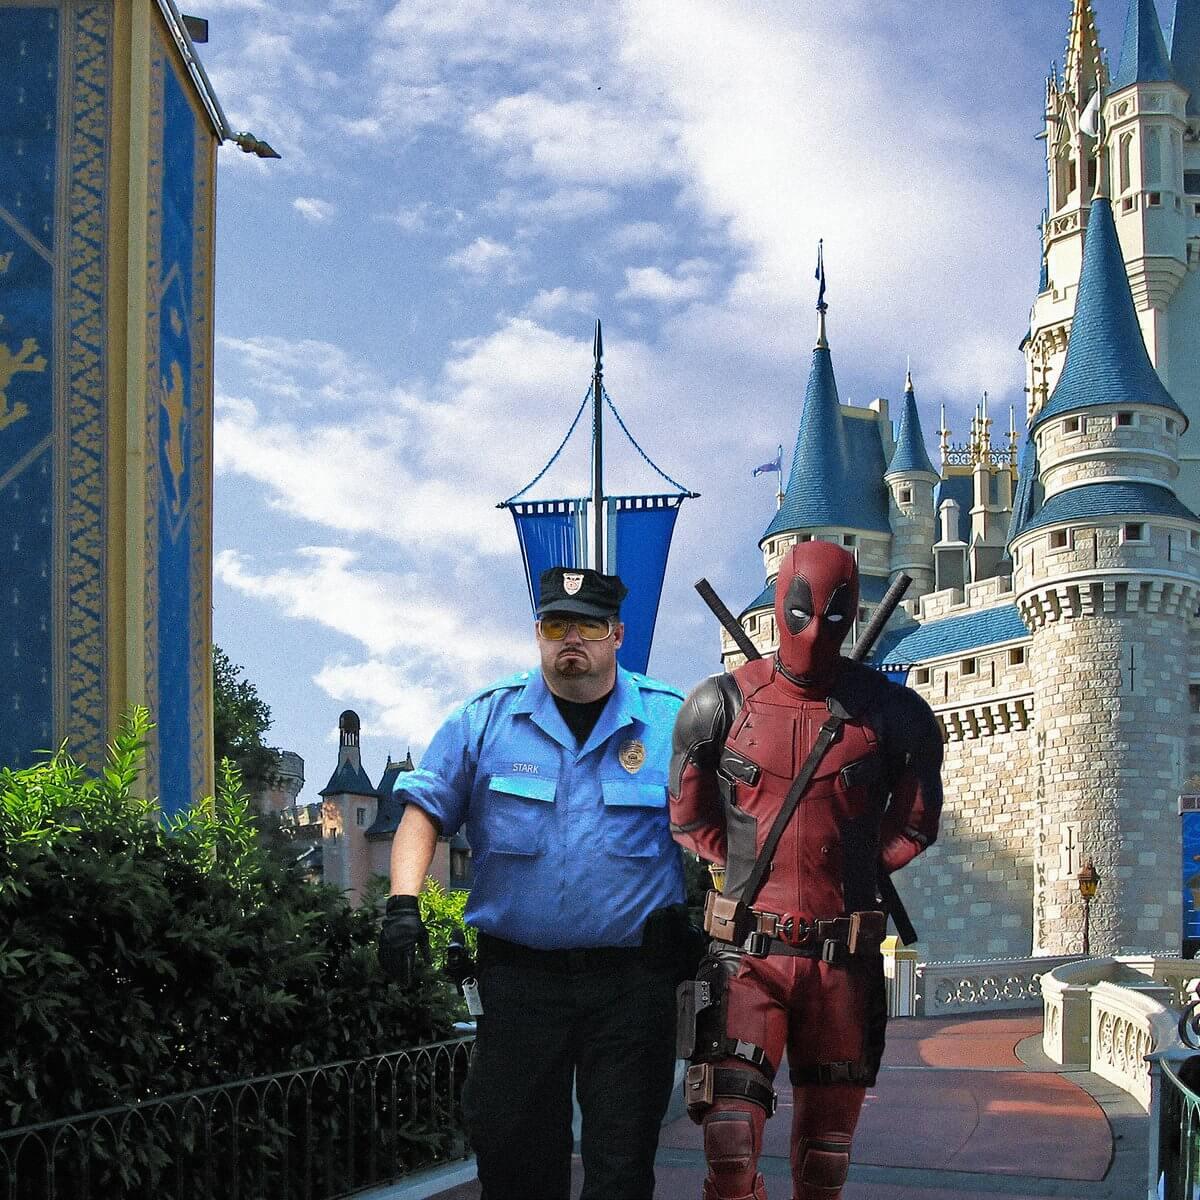 Deadpool at Magic Kingdom Tweet